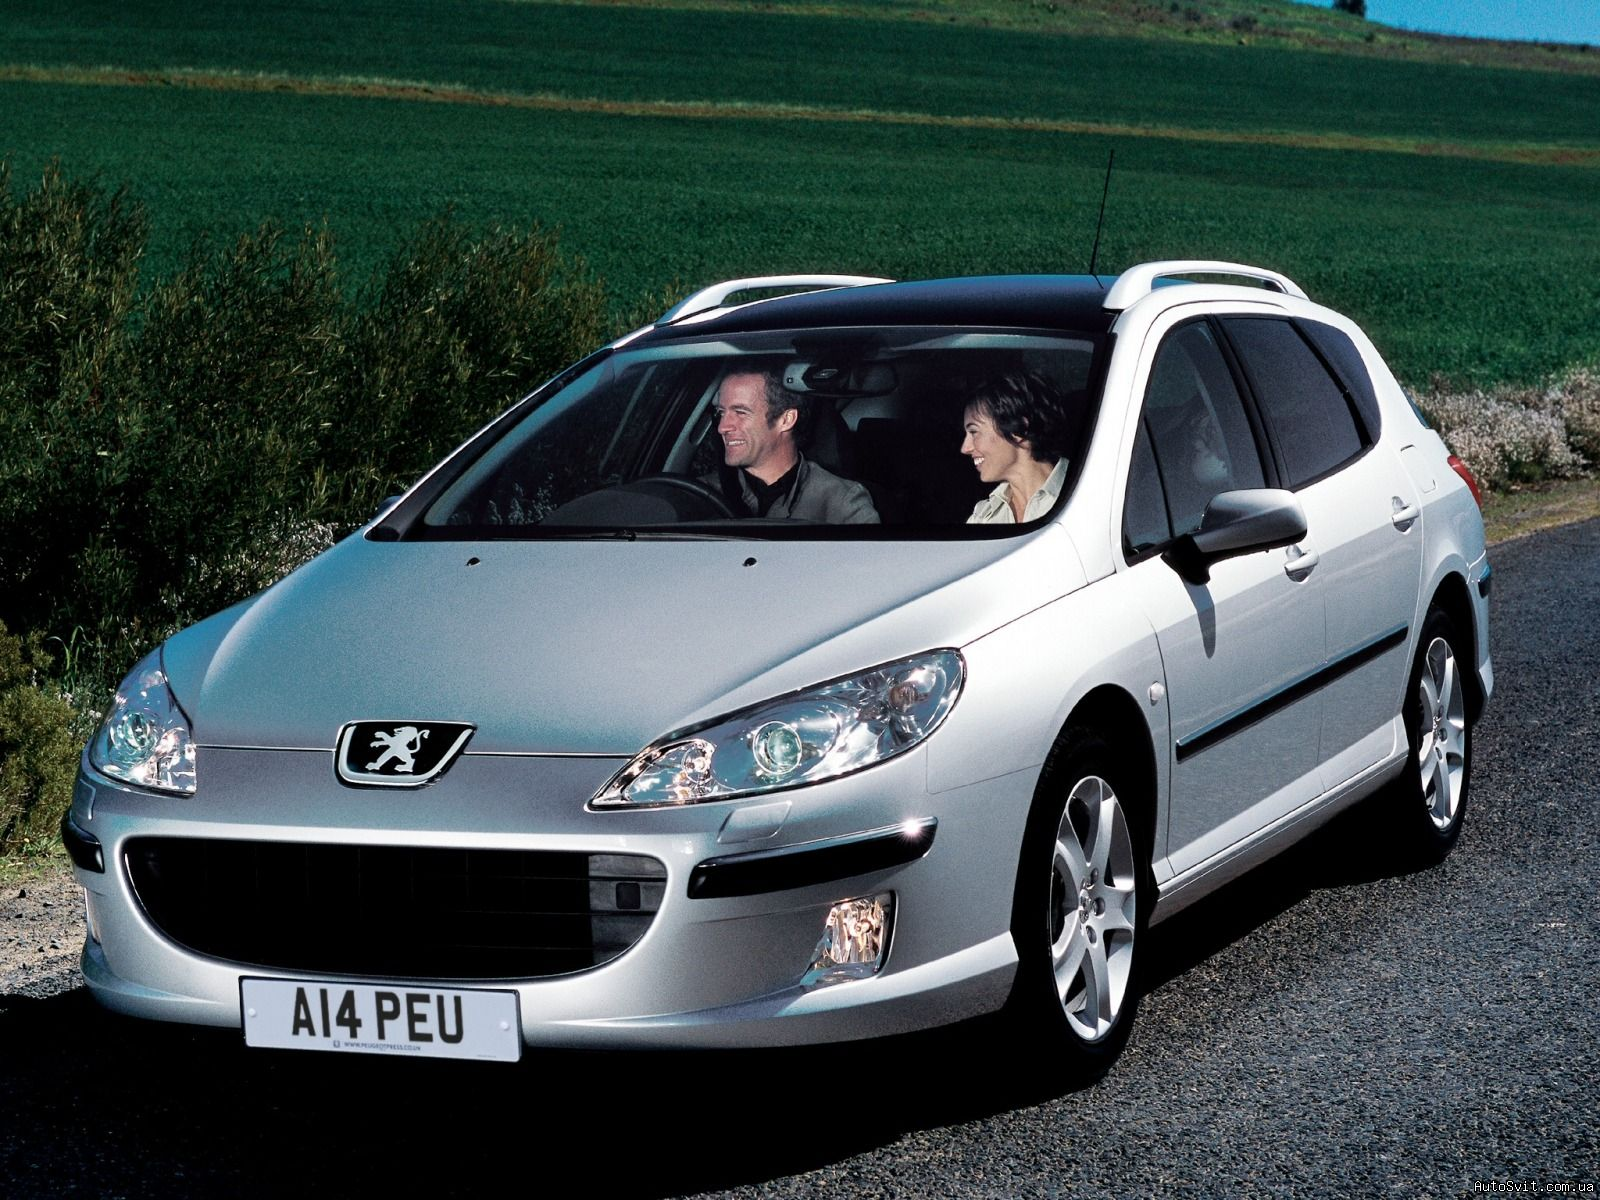 Peugeot 407 sw picture 11 reviews news specs buy car for Interieur 407 sw